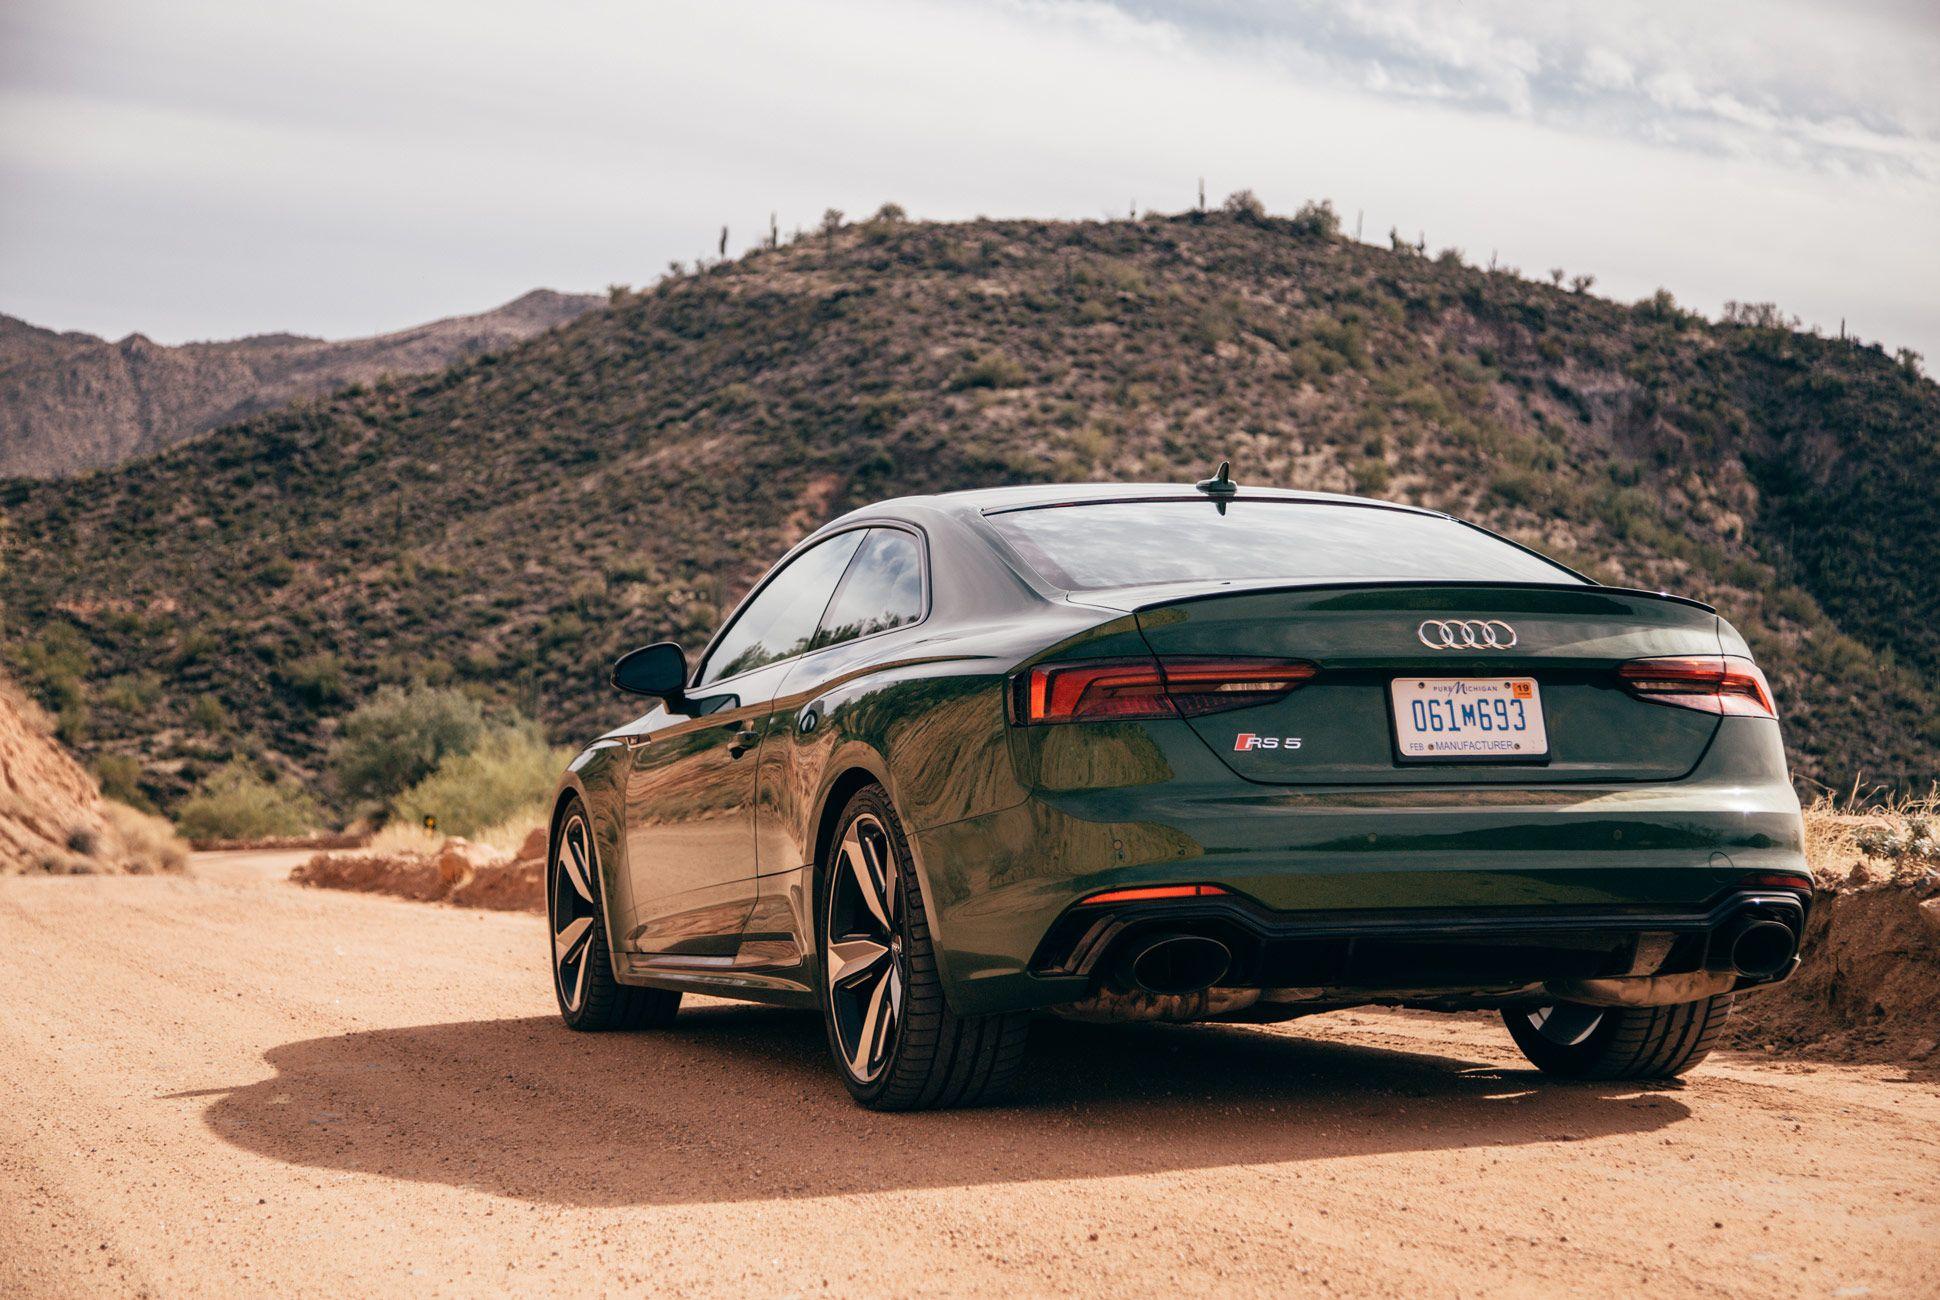 Audi-RS5-Gear-Patrol-Slide-2